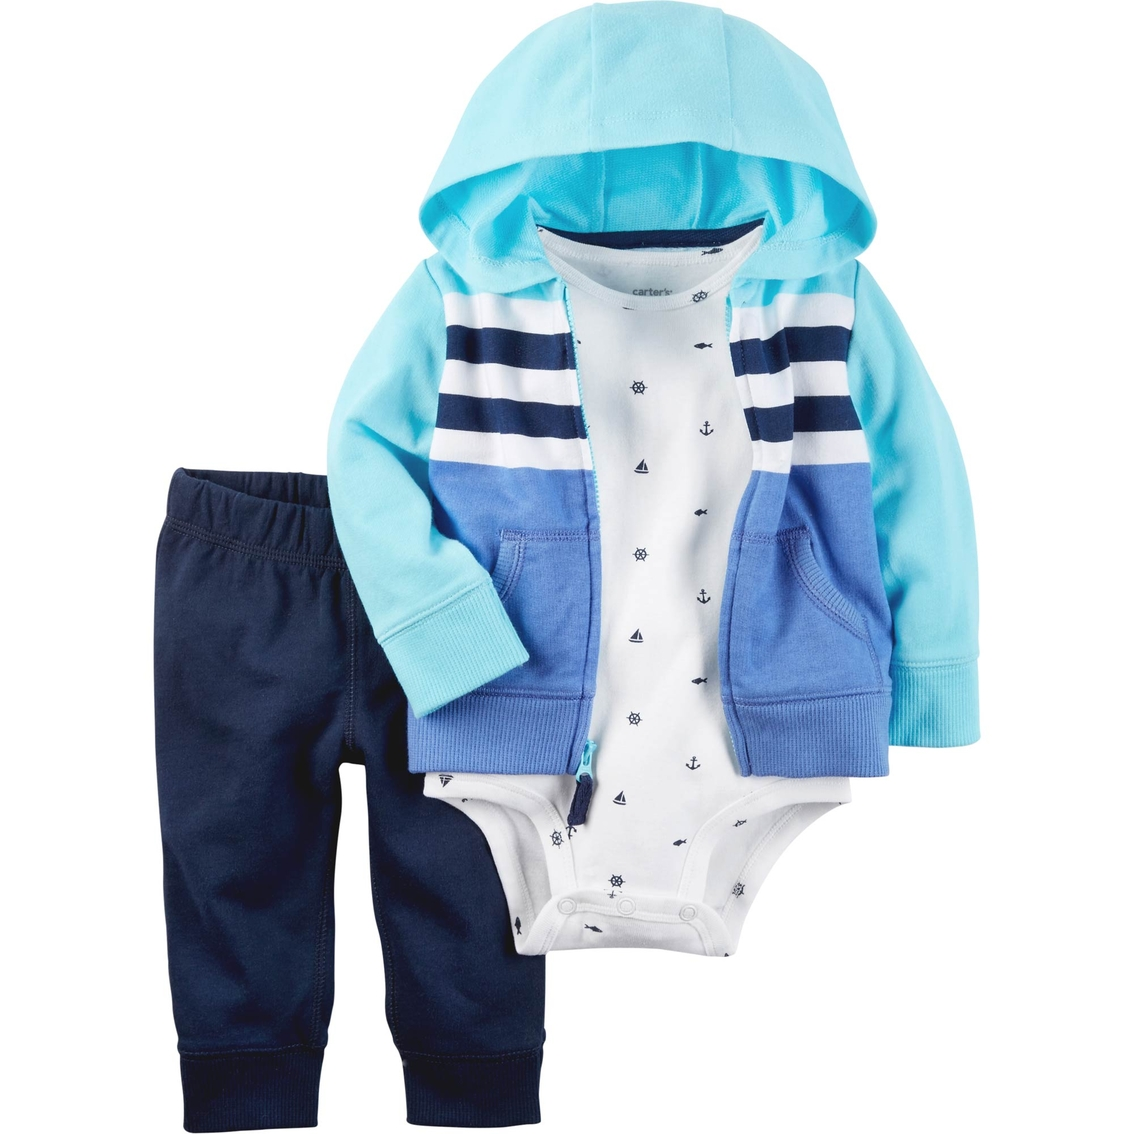 41094d149987 Carter s Infant Boys 3 Pc. Stripe Cardigan Set